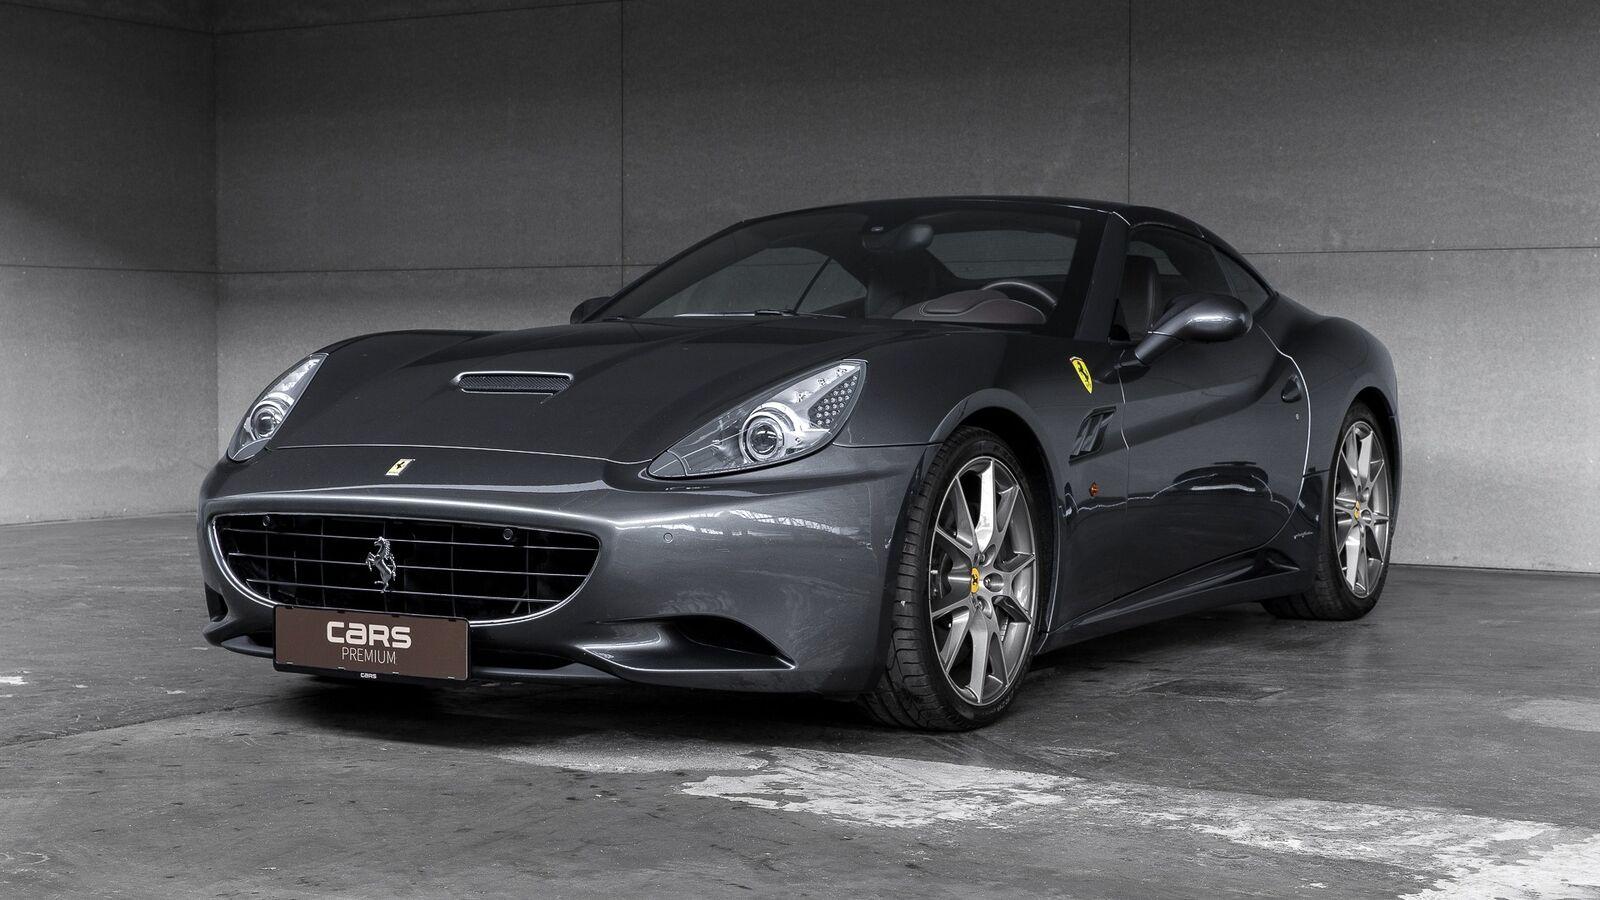 Ferrari California 30 4,3 F1 2d - 10.200 kr.